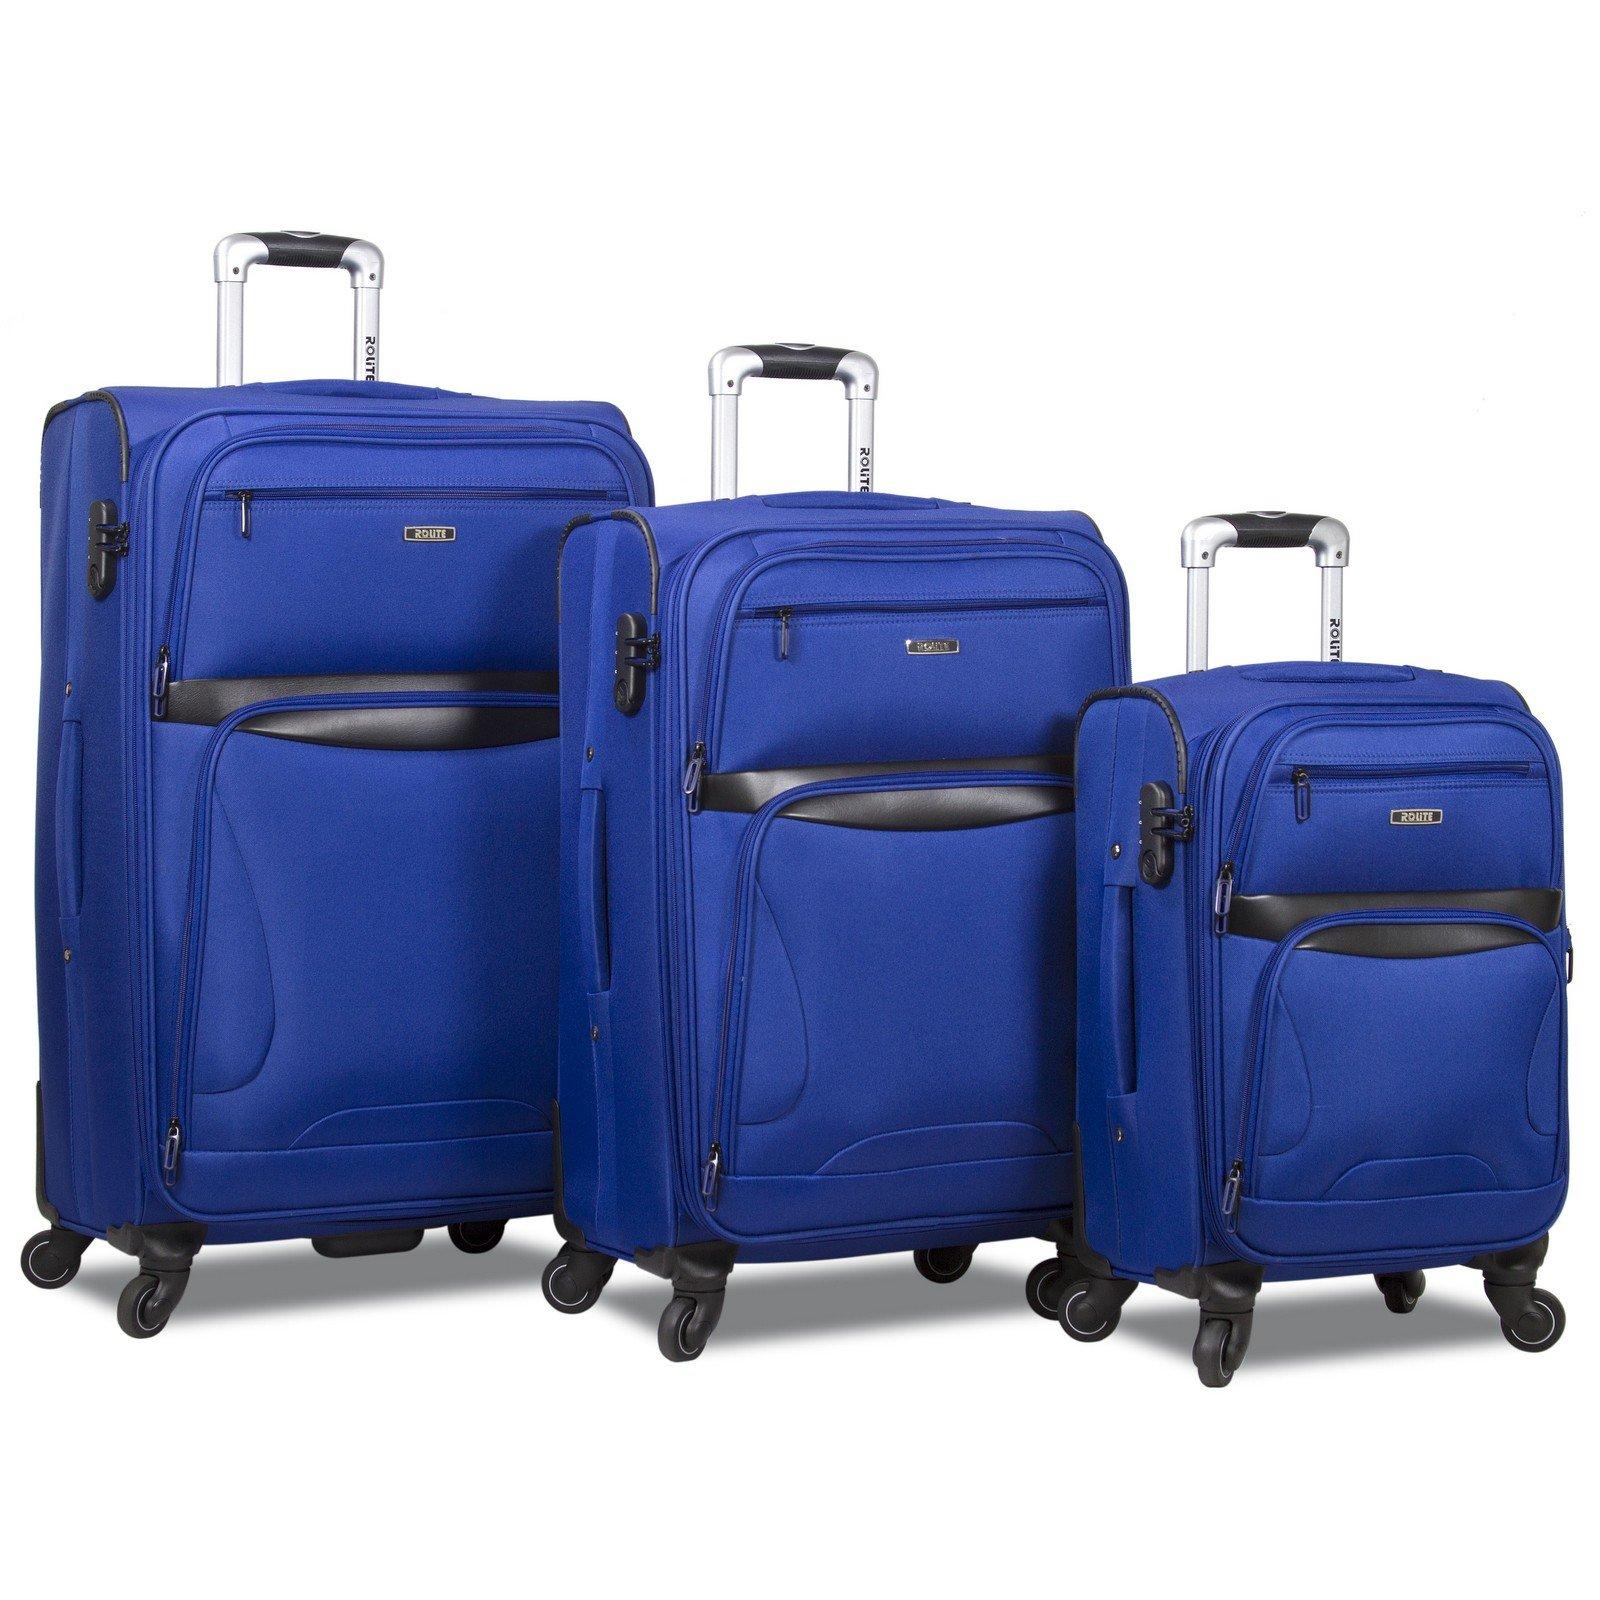 Rolite Explorer 3-Piece Expandable Spinner Luggage Set, Navy